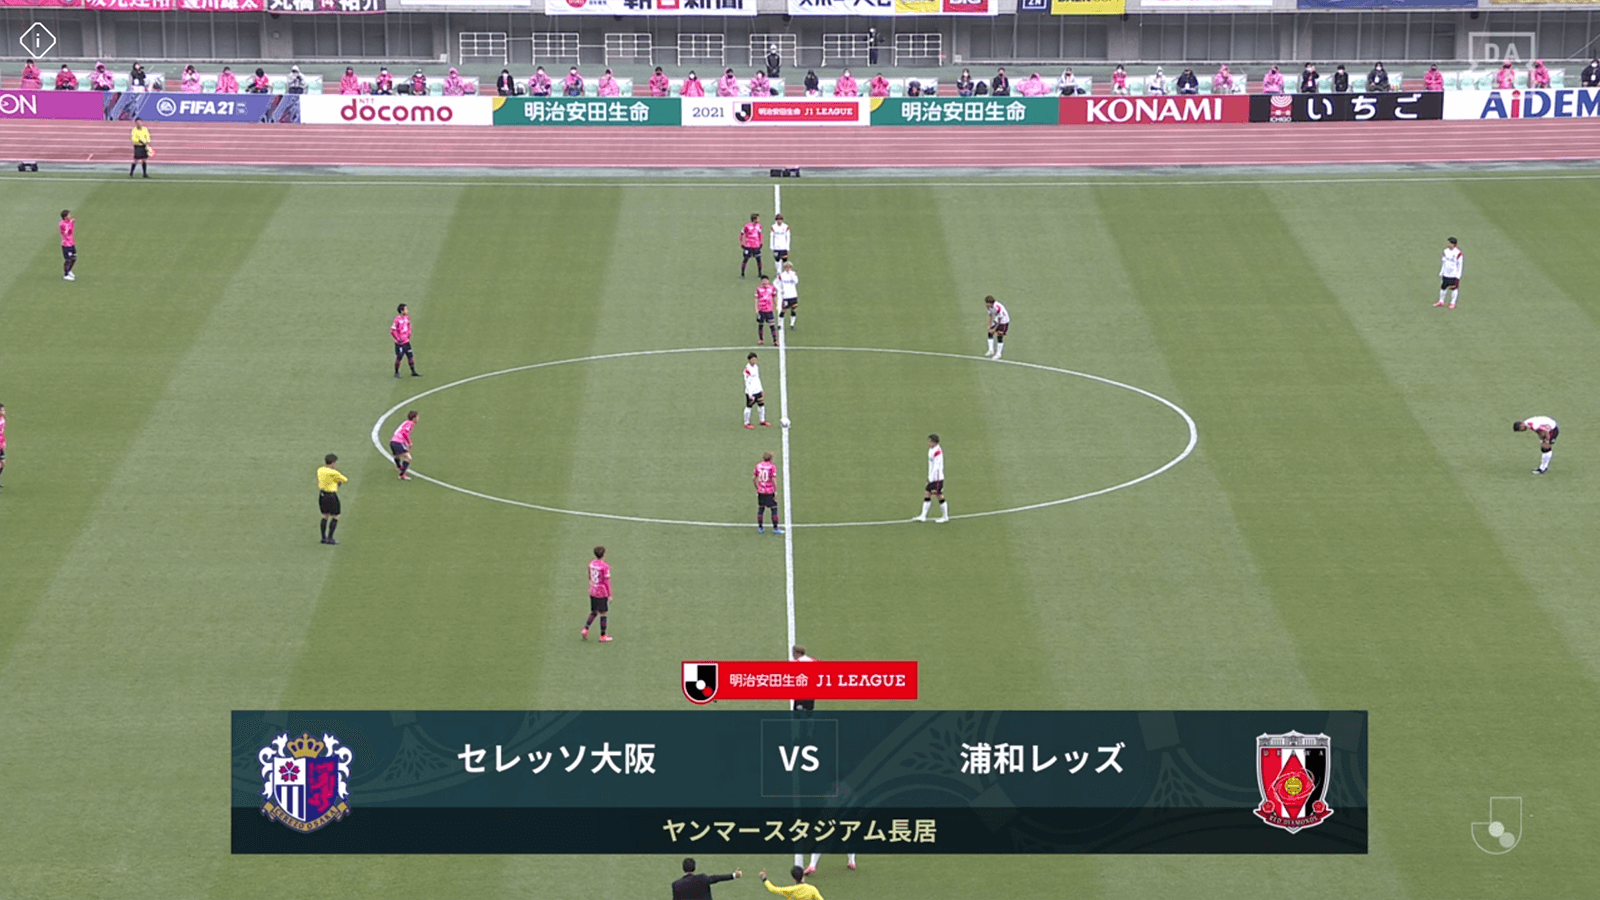 2021 Jリーグ 第10節 ヤンマースタジアム長居 セレッソ大阪戦